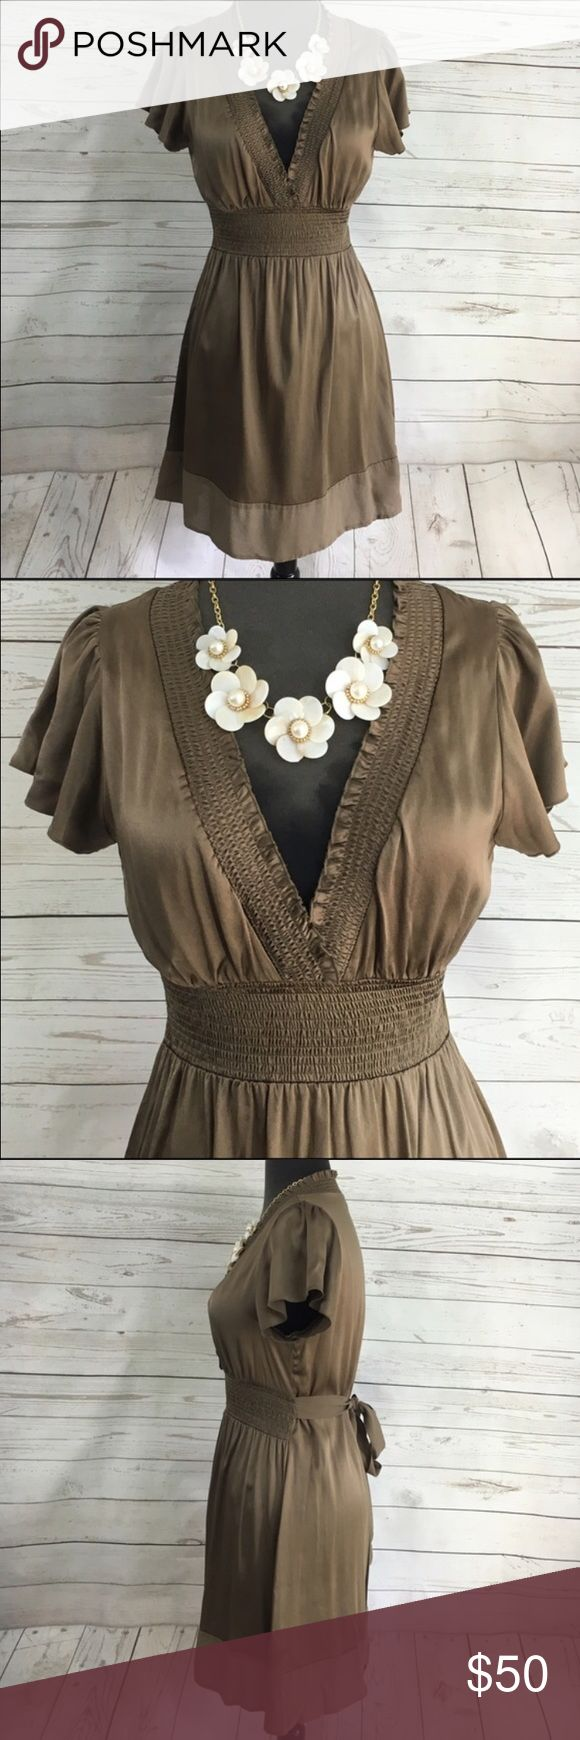 "BCBG Silk Olive Empire Dress Short Sleeve BCBG Maxazria XXS Silk Dress. Beautiful Olive color. Empire waist, V neckline, stretch in the waist. Ties in the back. Short sleeve. Made of 92% silk 8% spandex. Pre loved Good condition. Length 33"" Width 24"" Bust 30"" BCBGMaxAzria Dresses Midi"